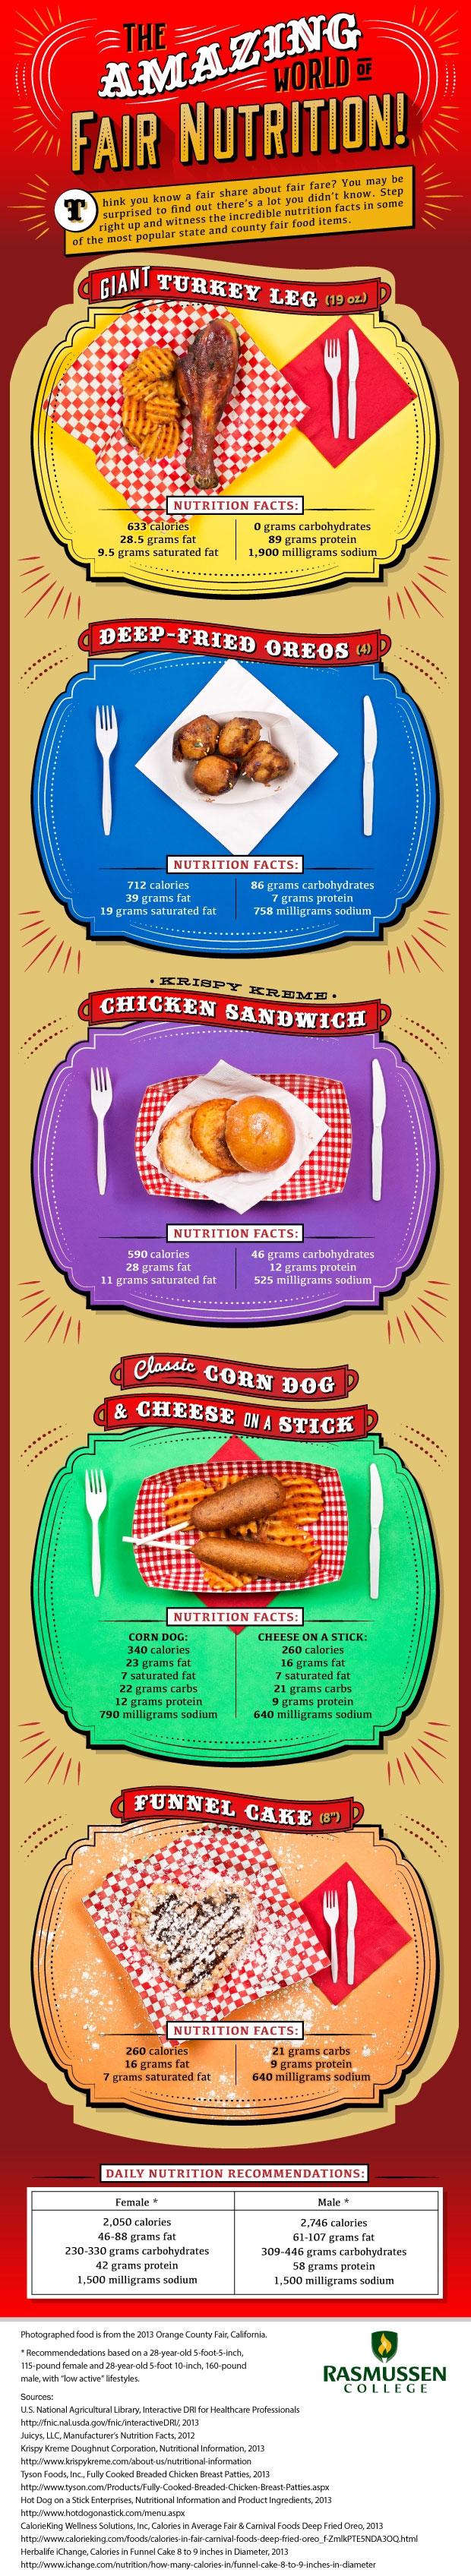 2013-08-28-foodbeastfairnutrition.jpg